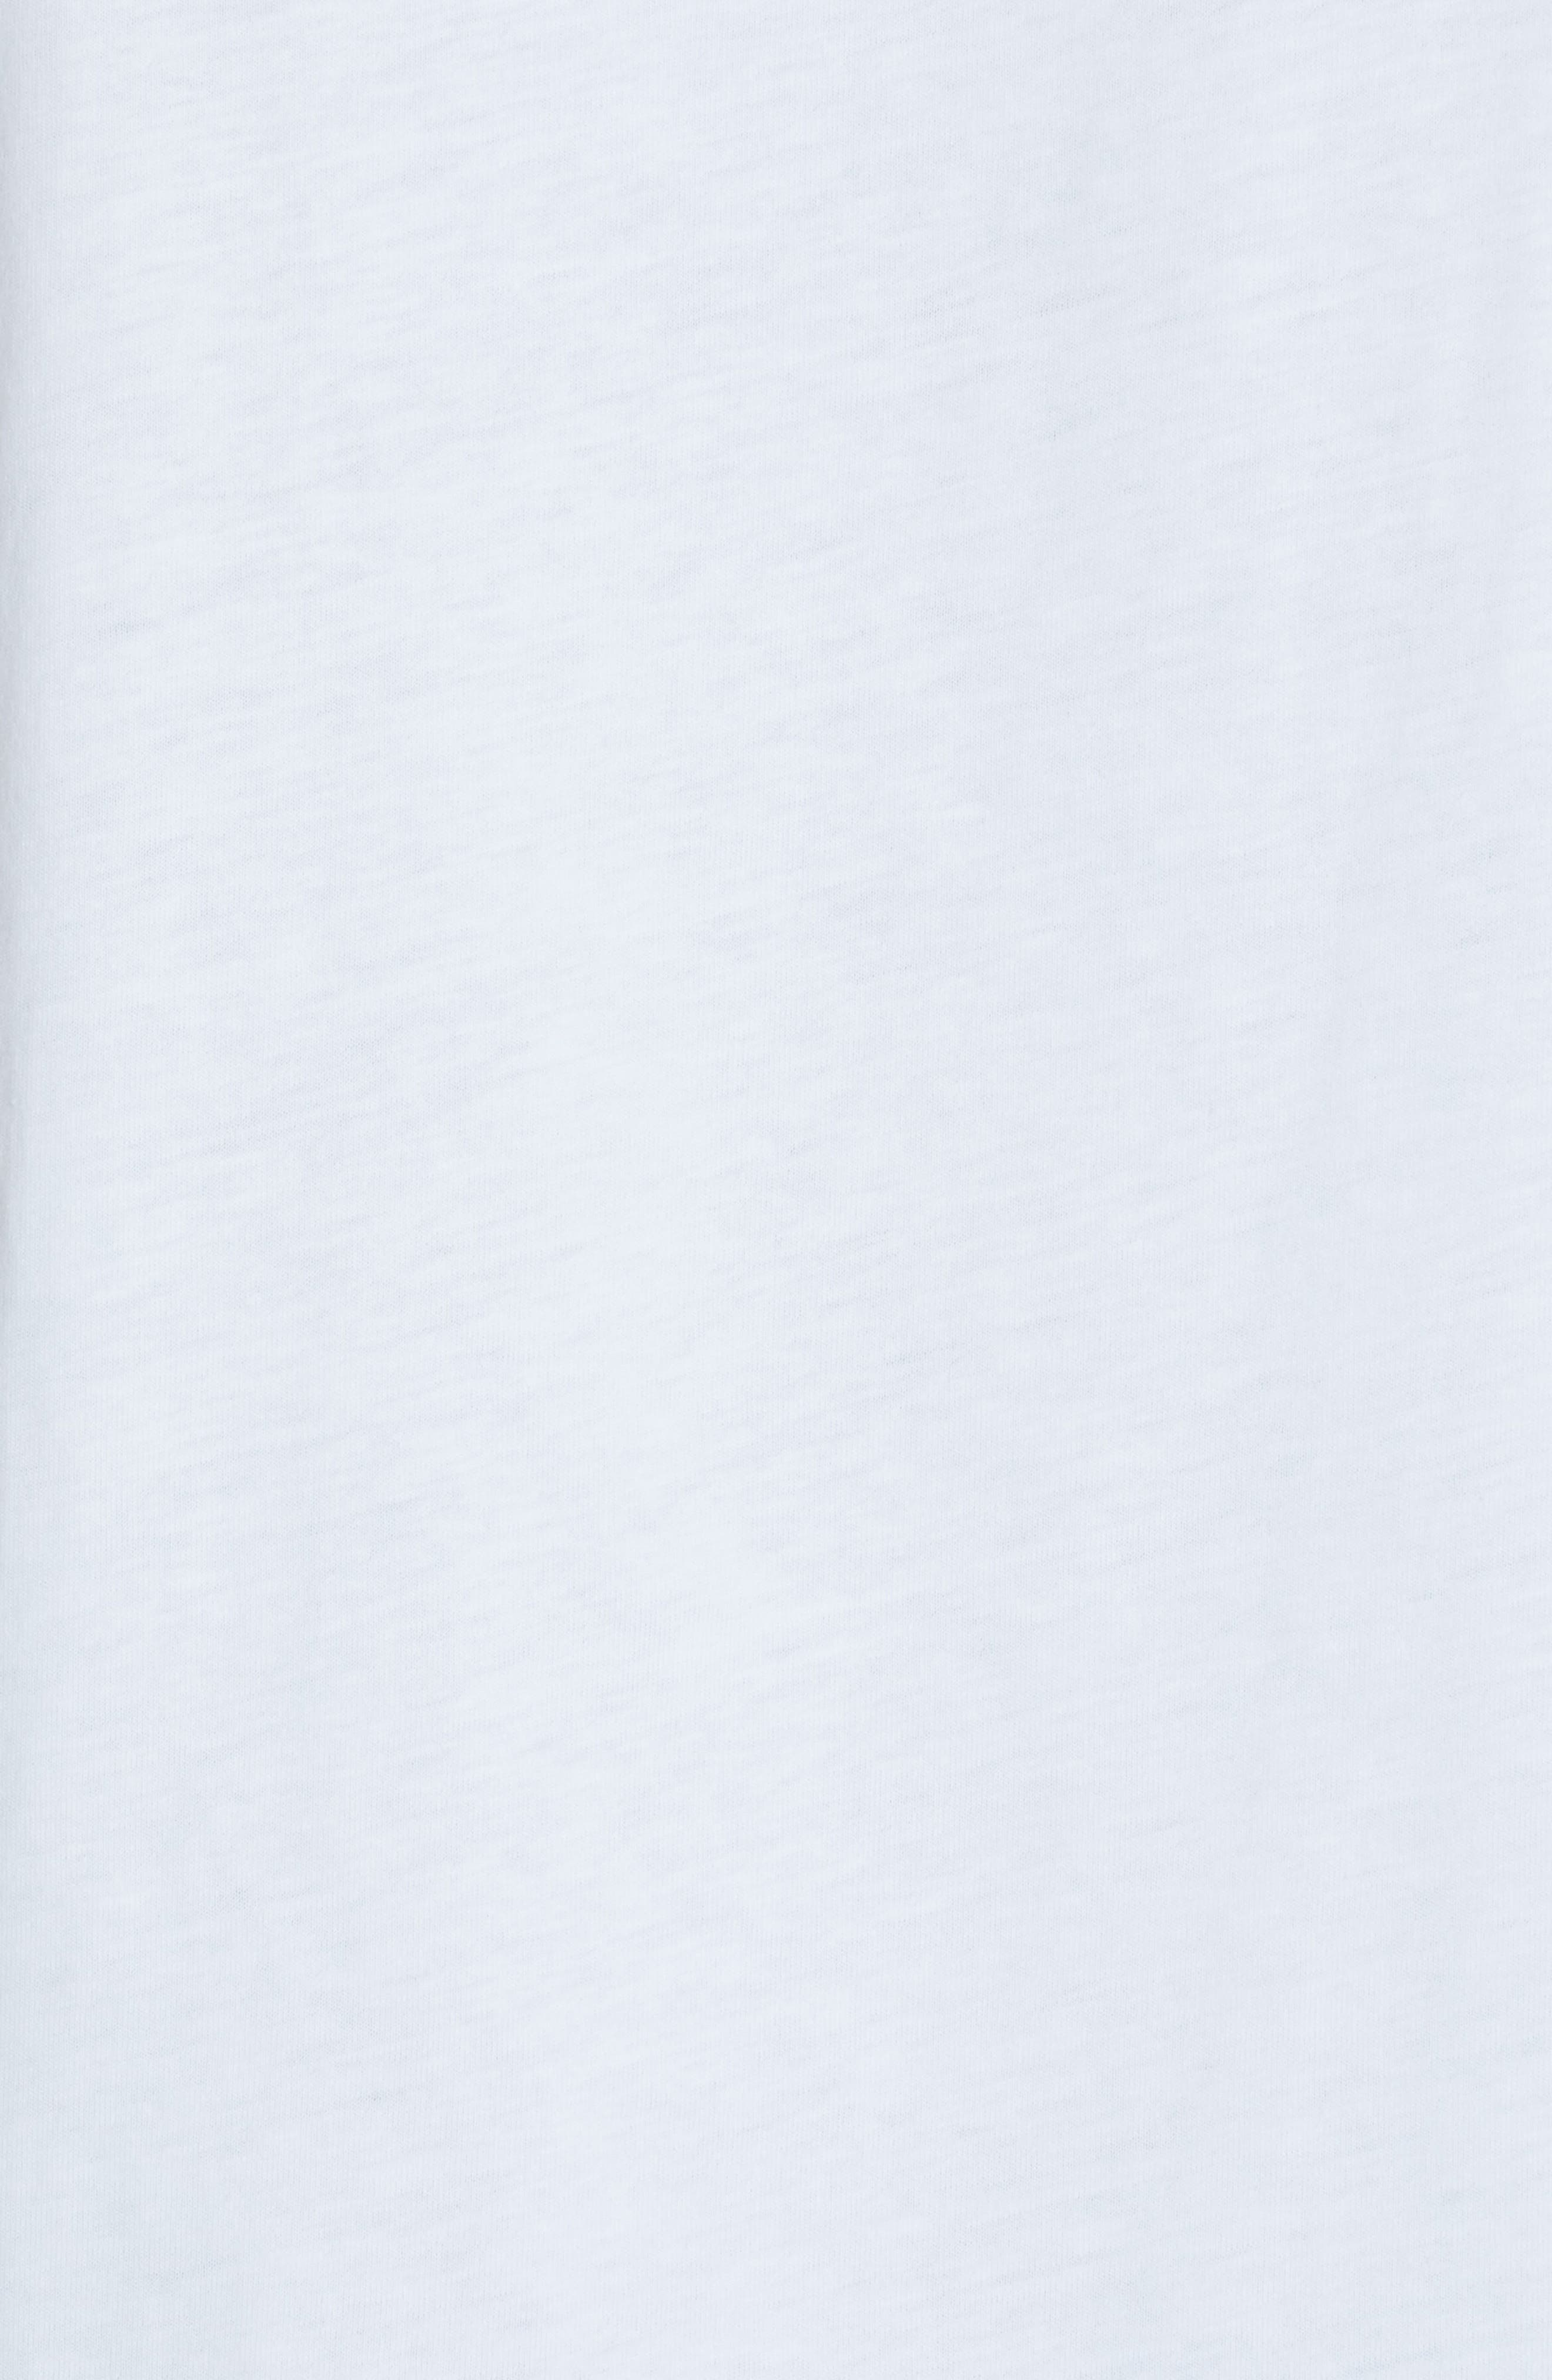 MOSCHINO, Circus Teddy Tee, Alternate thumbnail 5, color, WHITE